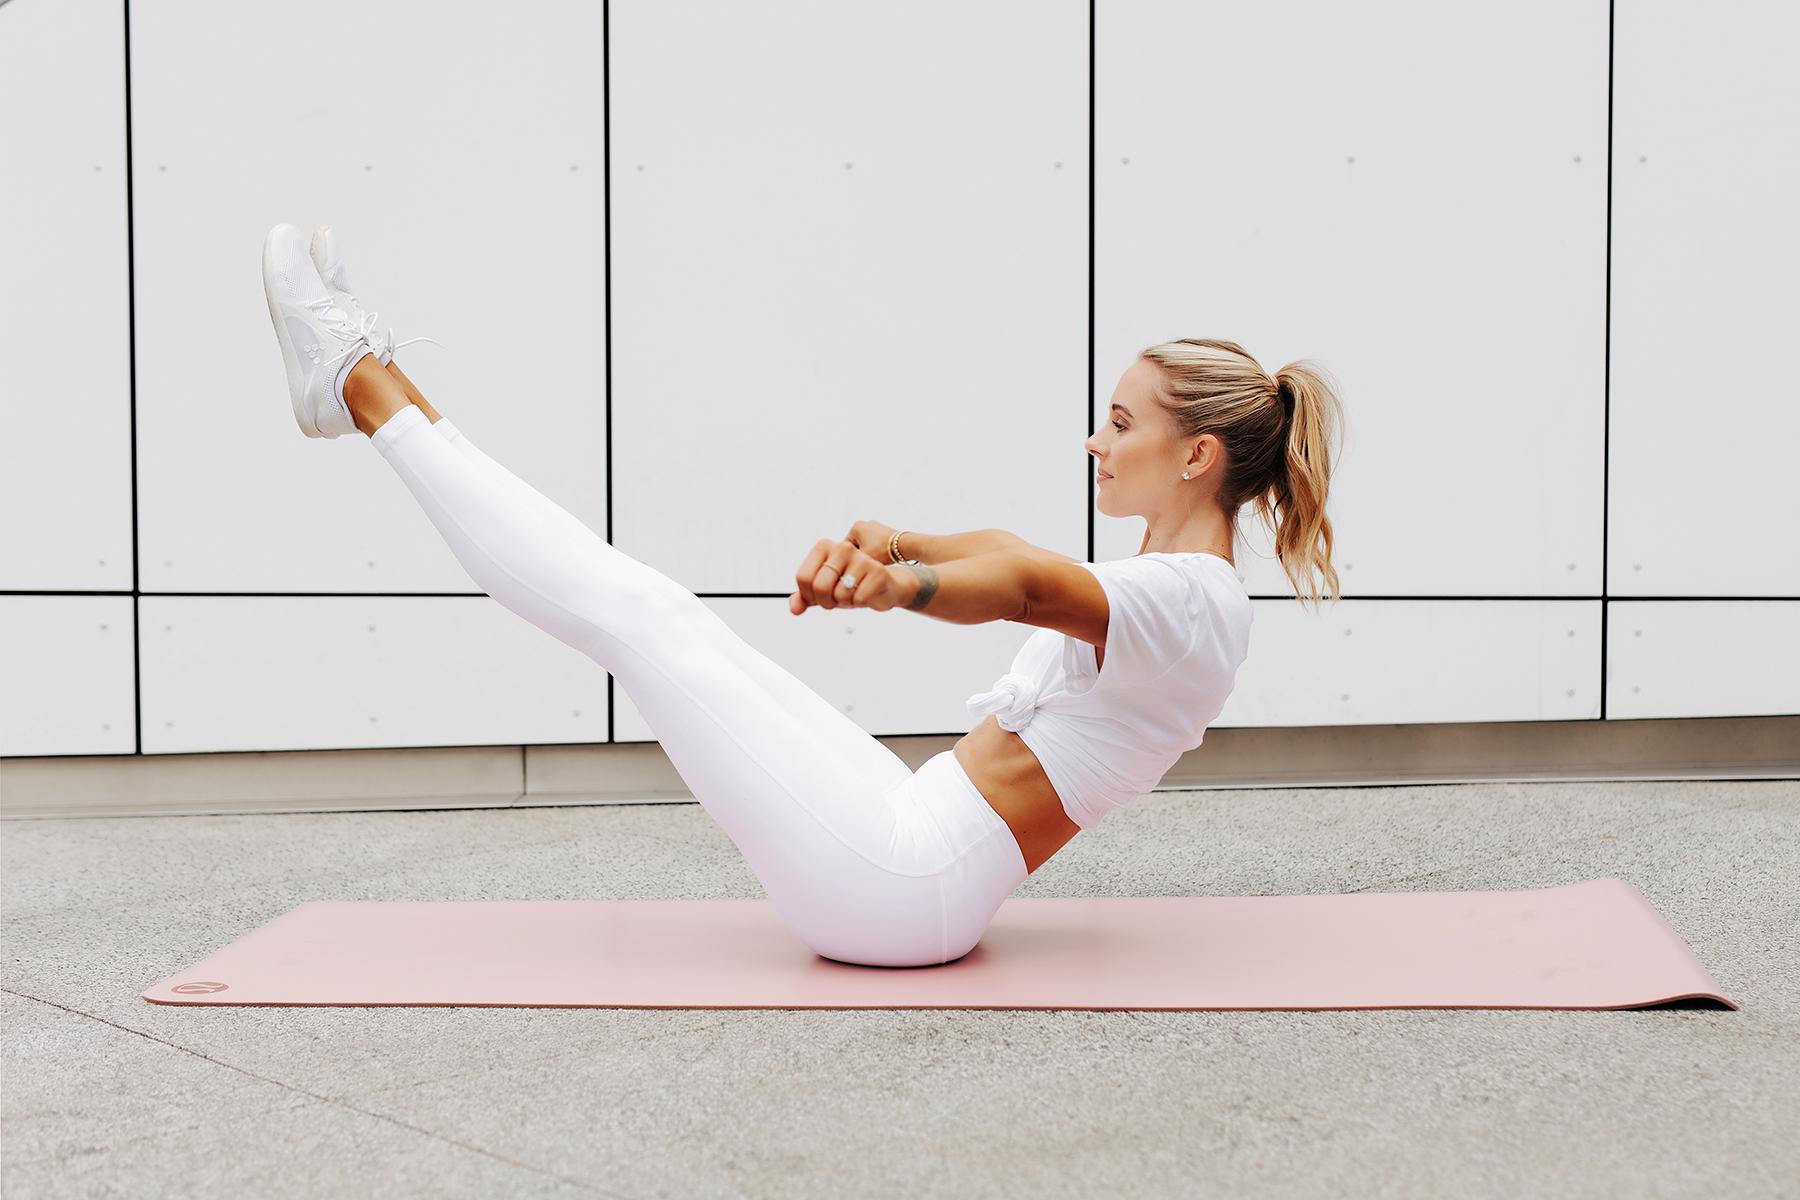 Fashion Jackson Wearing lululemon White Tshirt lululemon White Align Leggings White Sneakers V-Sit Hold Position Simple Ab Exercise